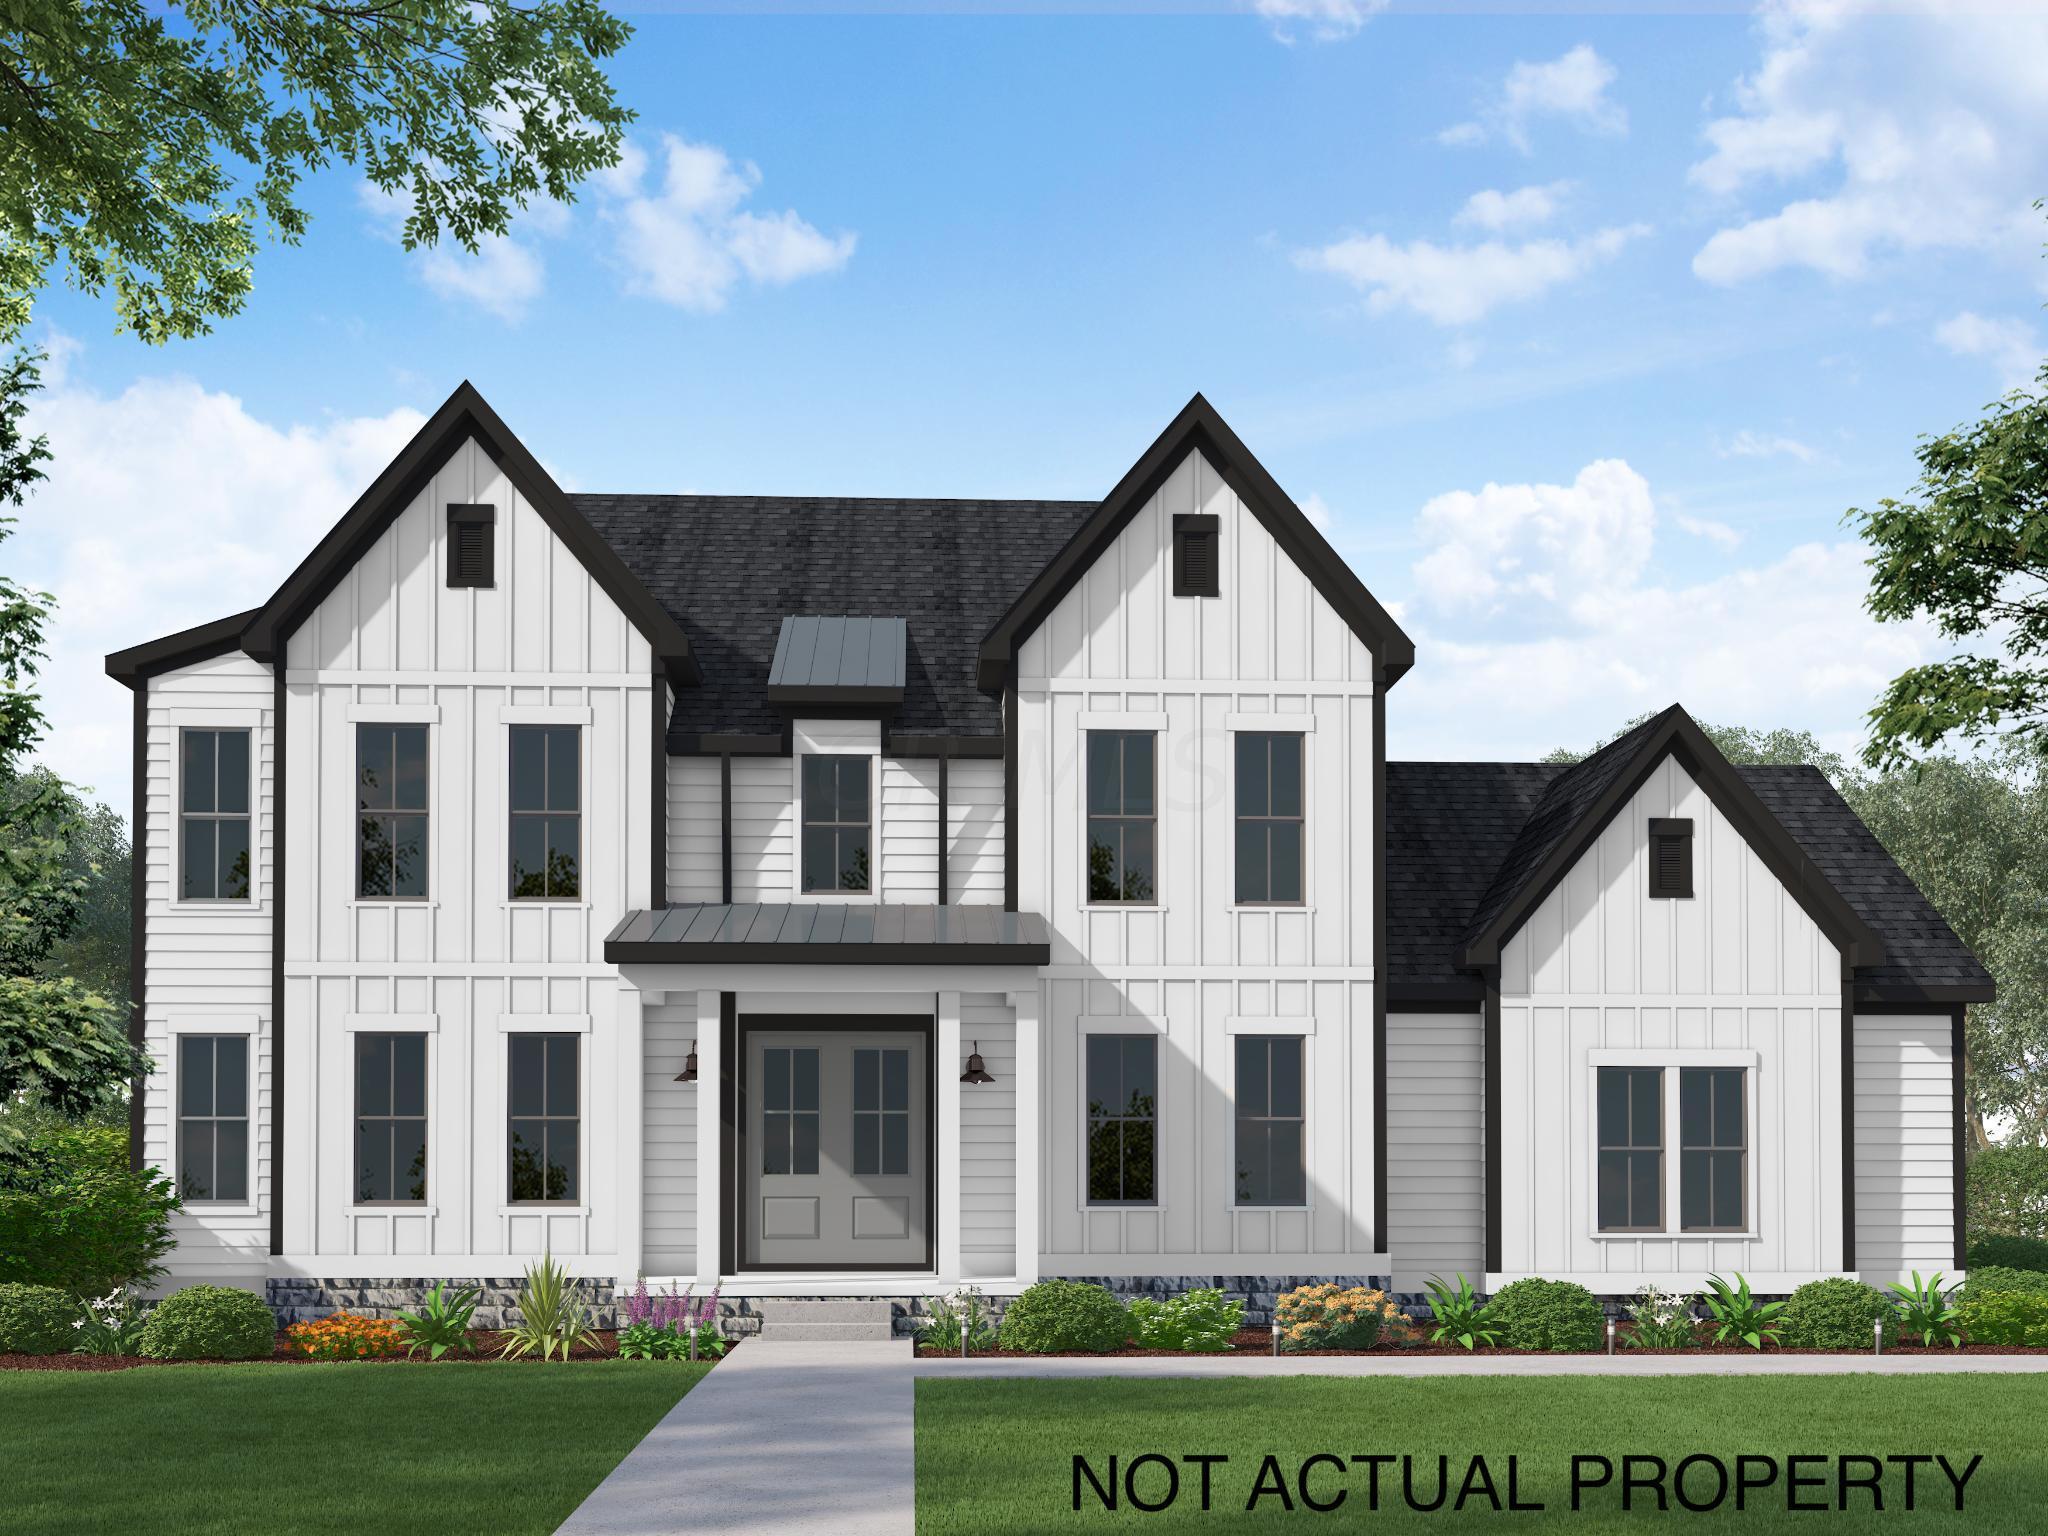 11259 Cedar Crest Drive, Plain City, Ohio 43064, 5 Bedrooms Bedrooms, ,5 BathroomsBathrooms,Residential,For Sale,Cedar Crest,220031593